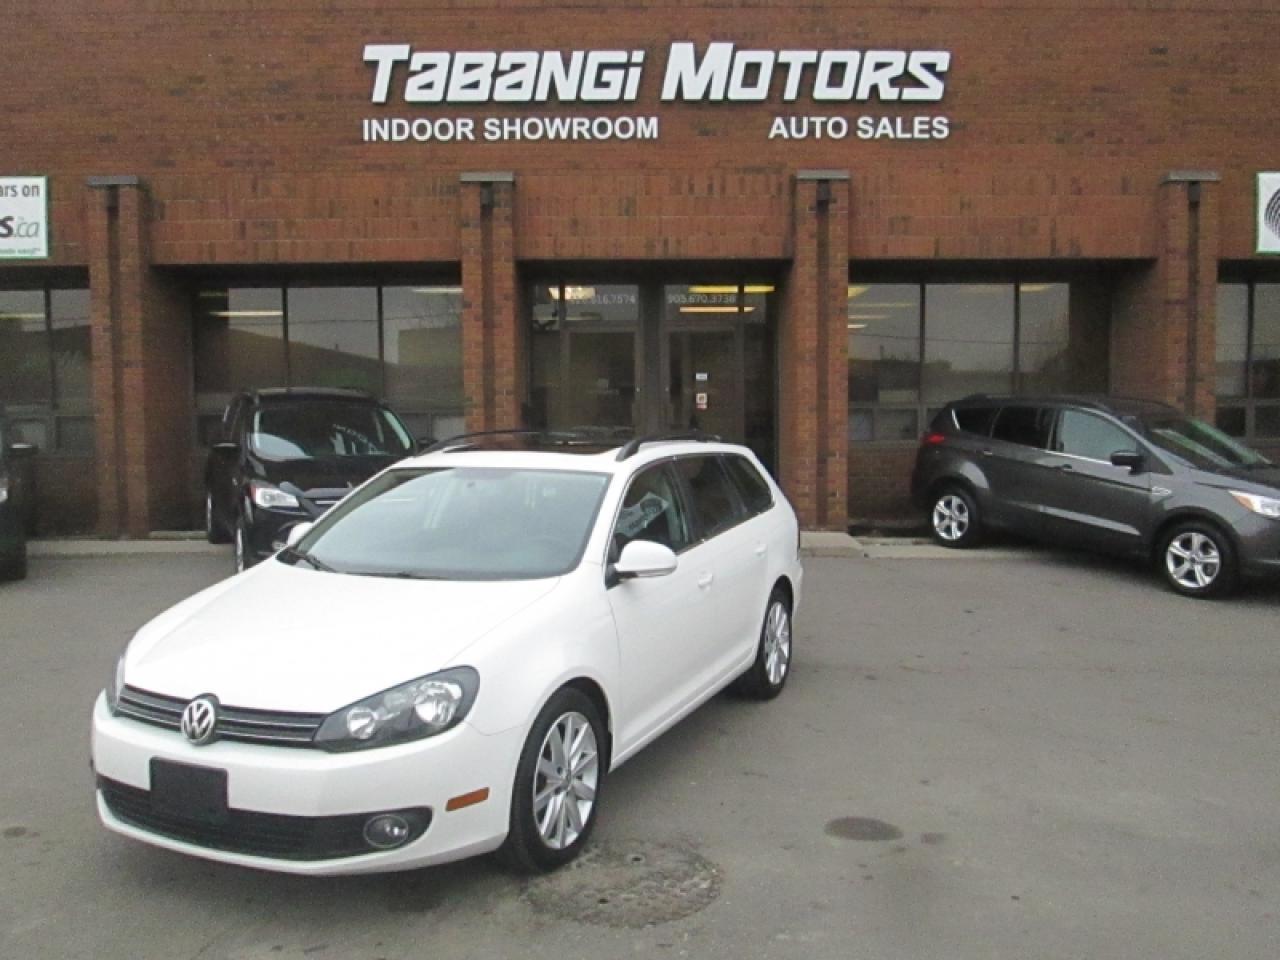 Photo of White 2012 Volkswagen Golf Wagon